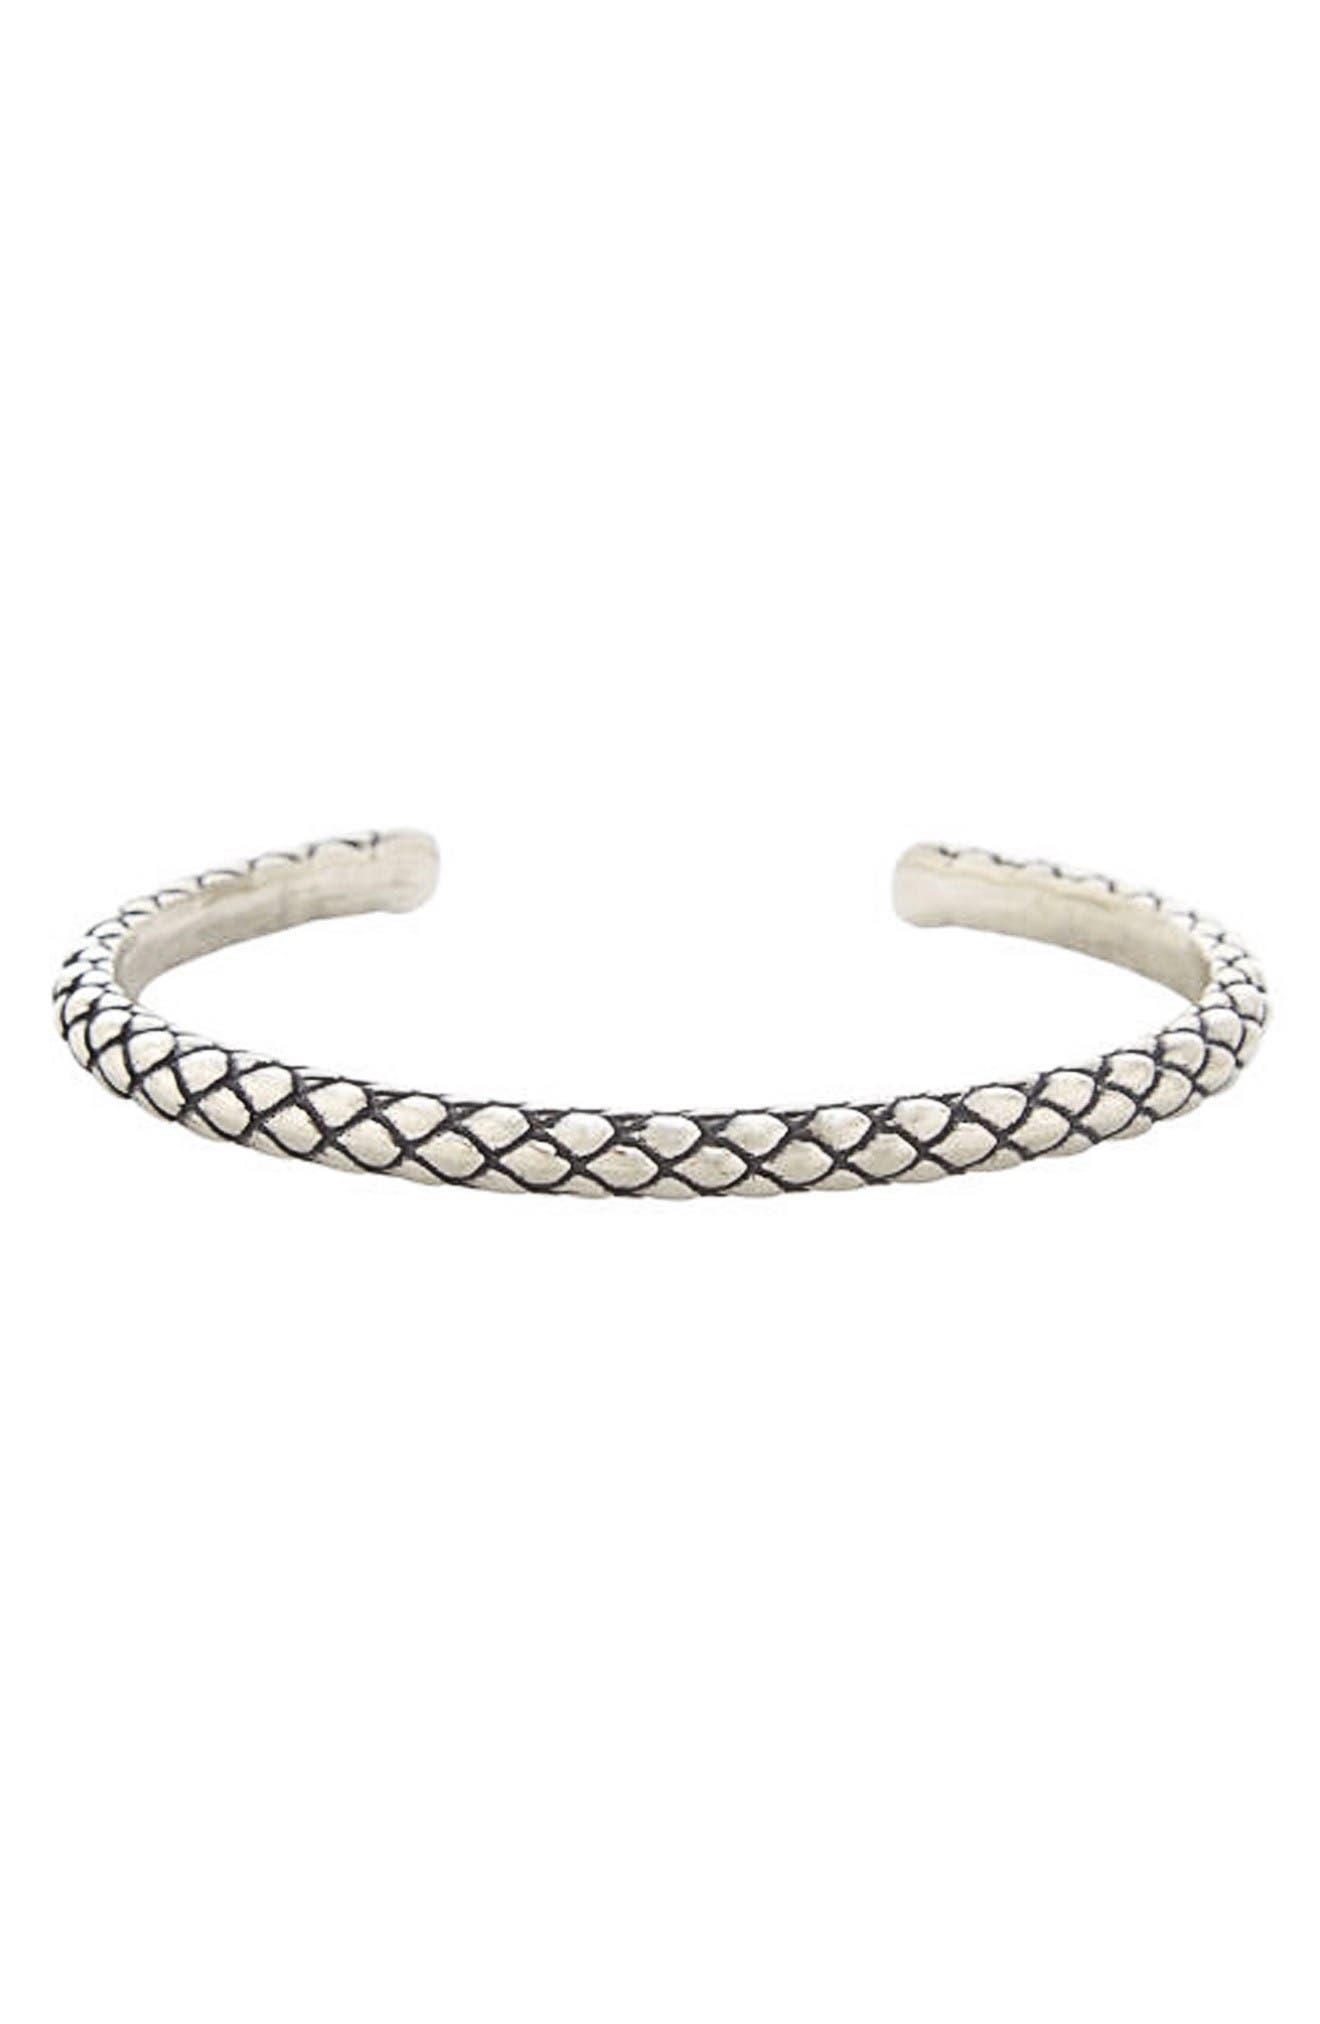 Main Image - Degs & Sal Stealth Cuff Bracelet